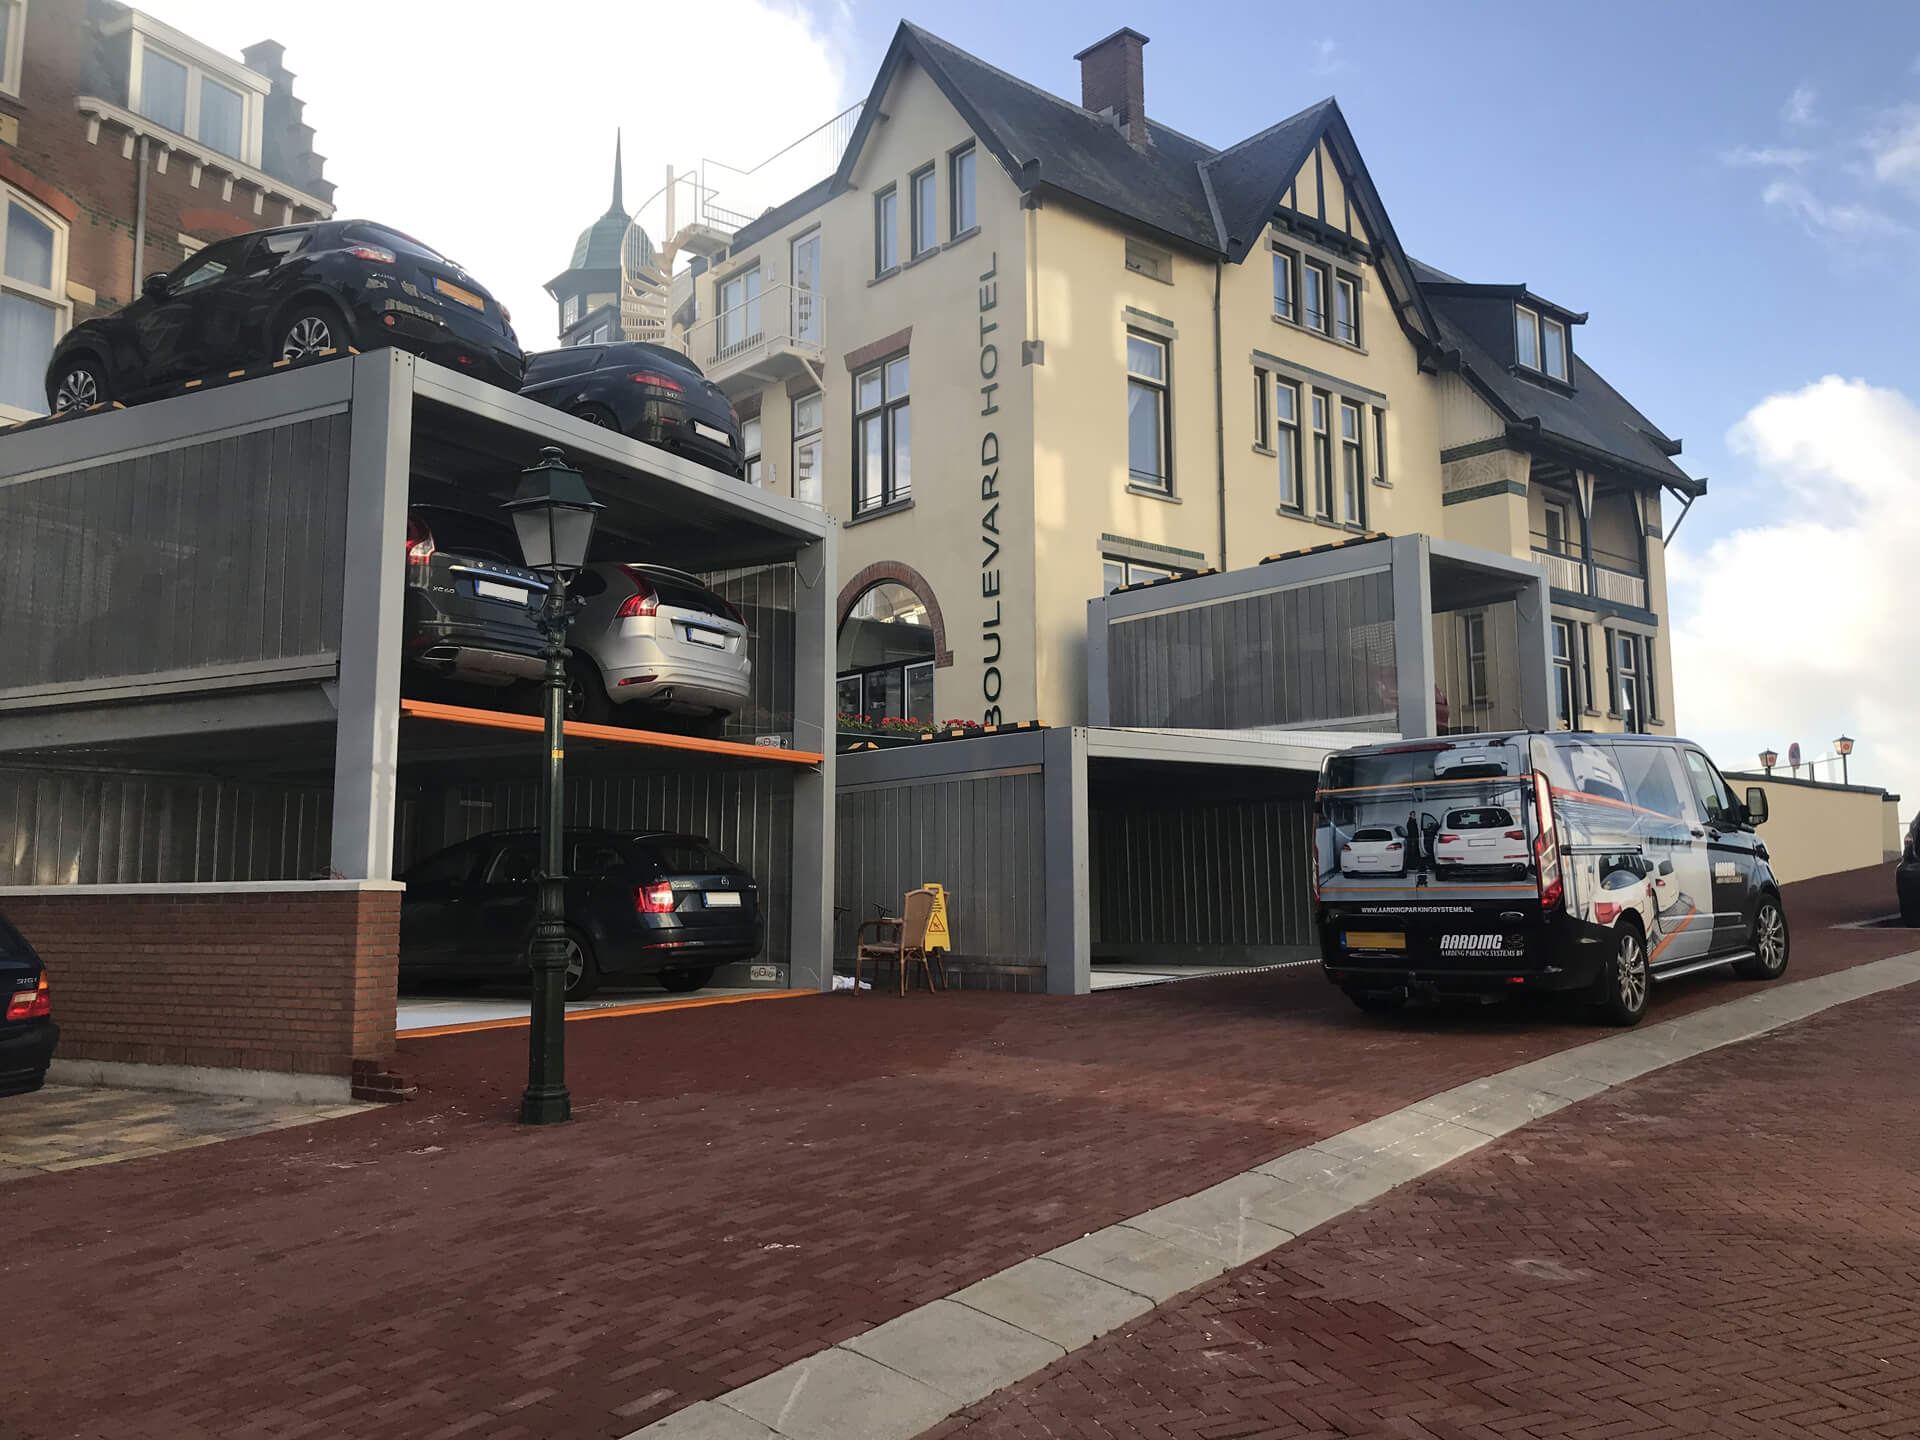 Project Parkeersysteem MultiBase U2 Scheveningen - Aarding Parking Systems 4